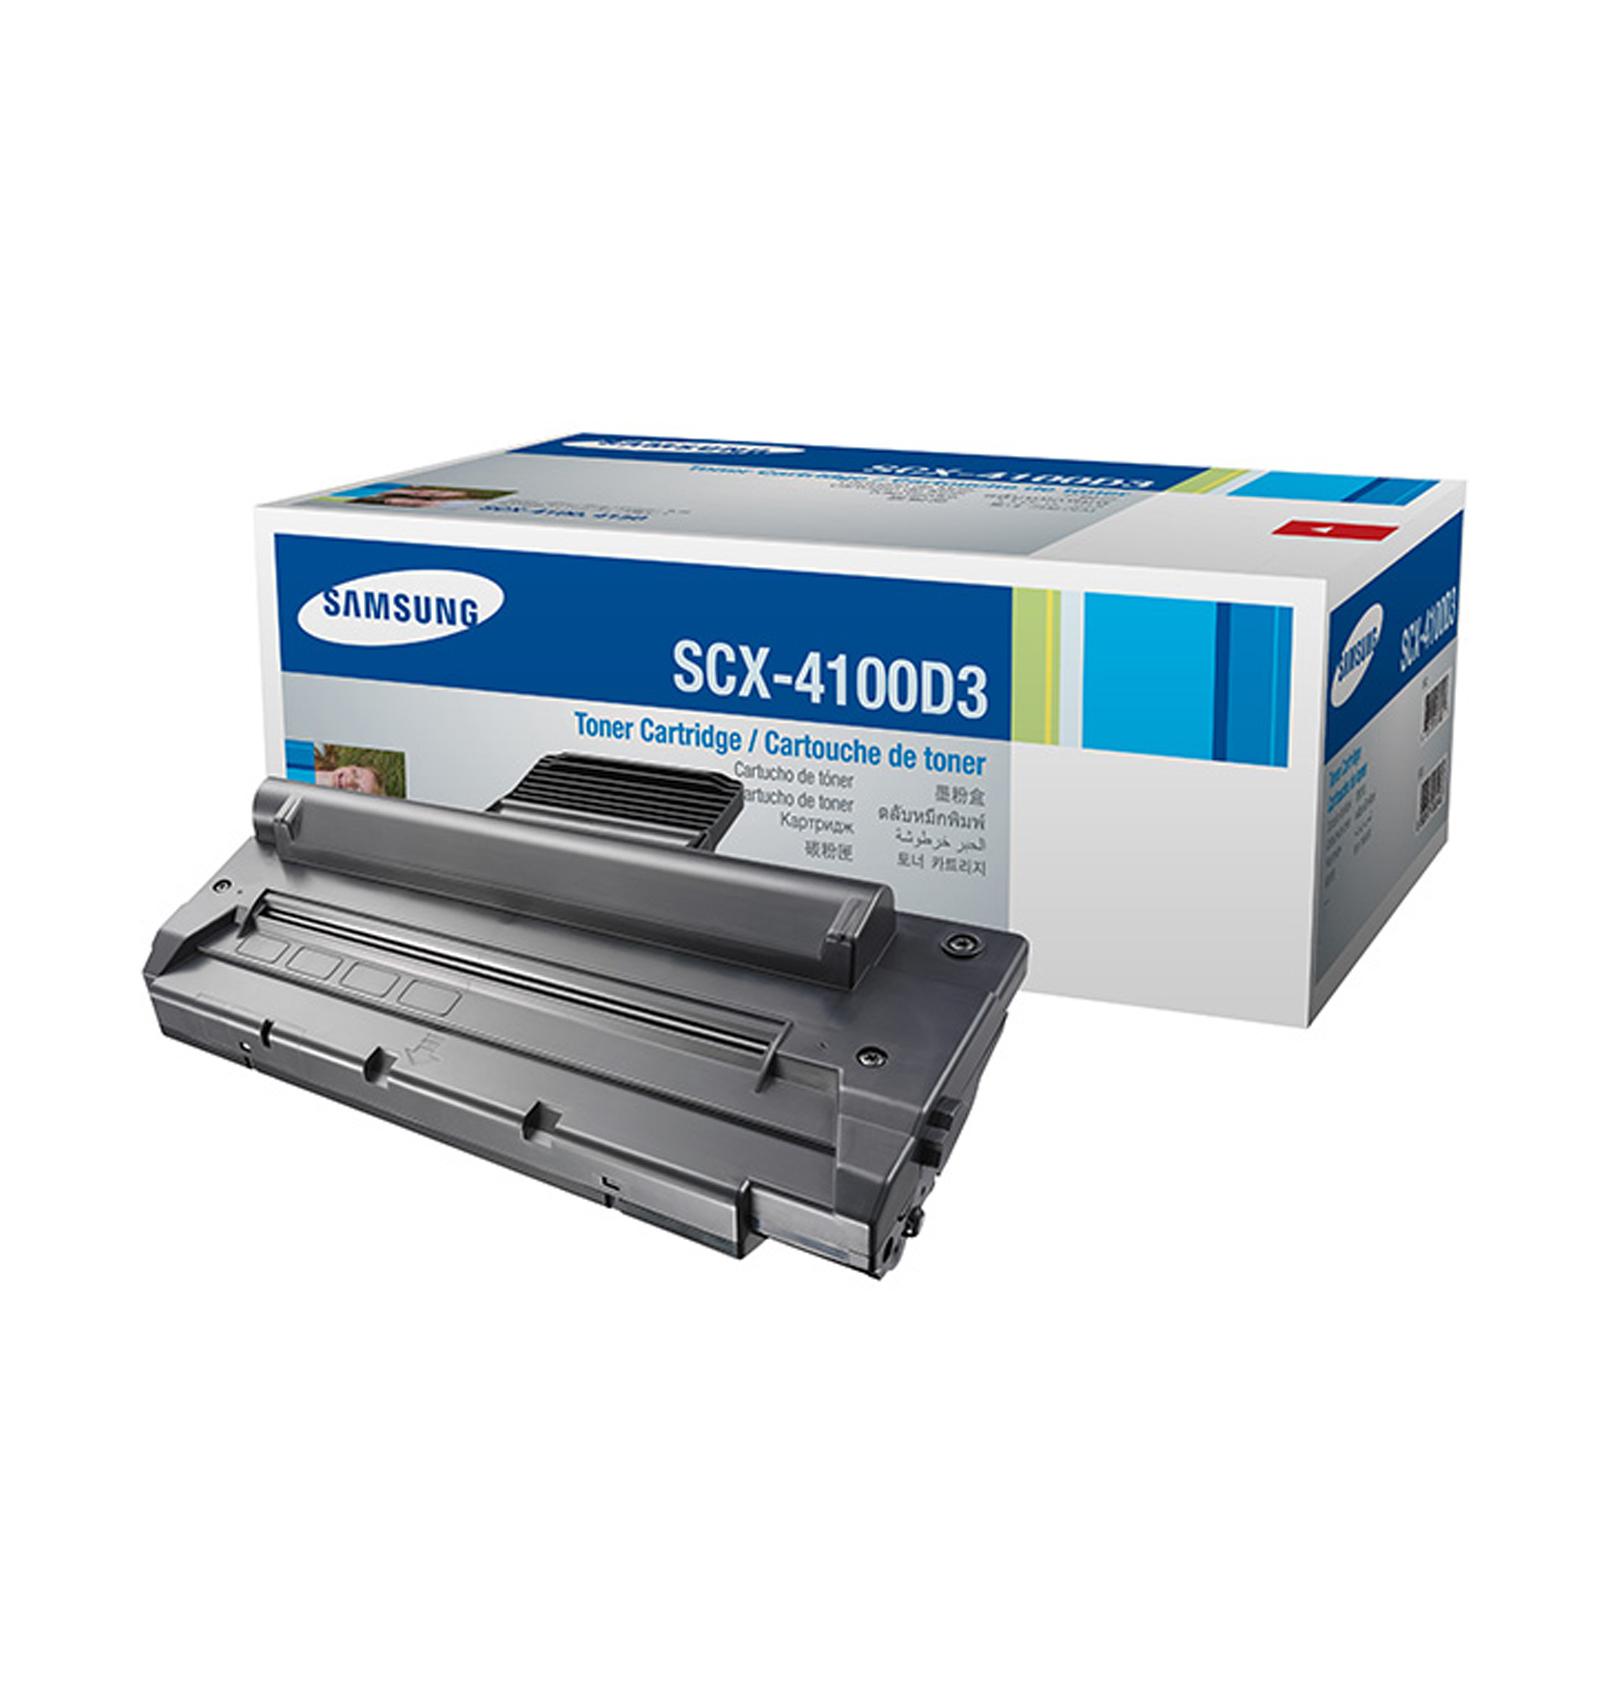 Заправка картриджей Samsung SCX-4100D3 для SCX-4100/4150